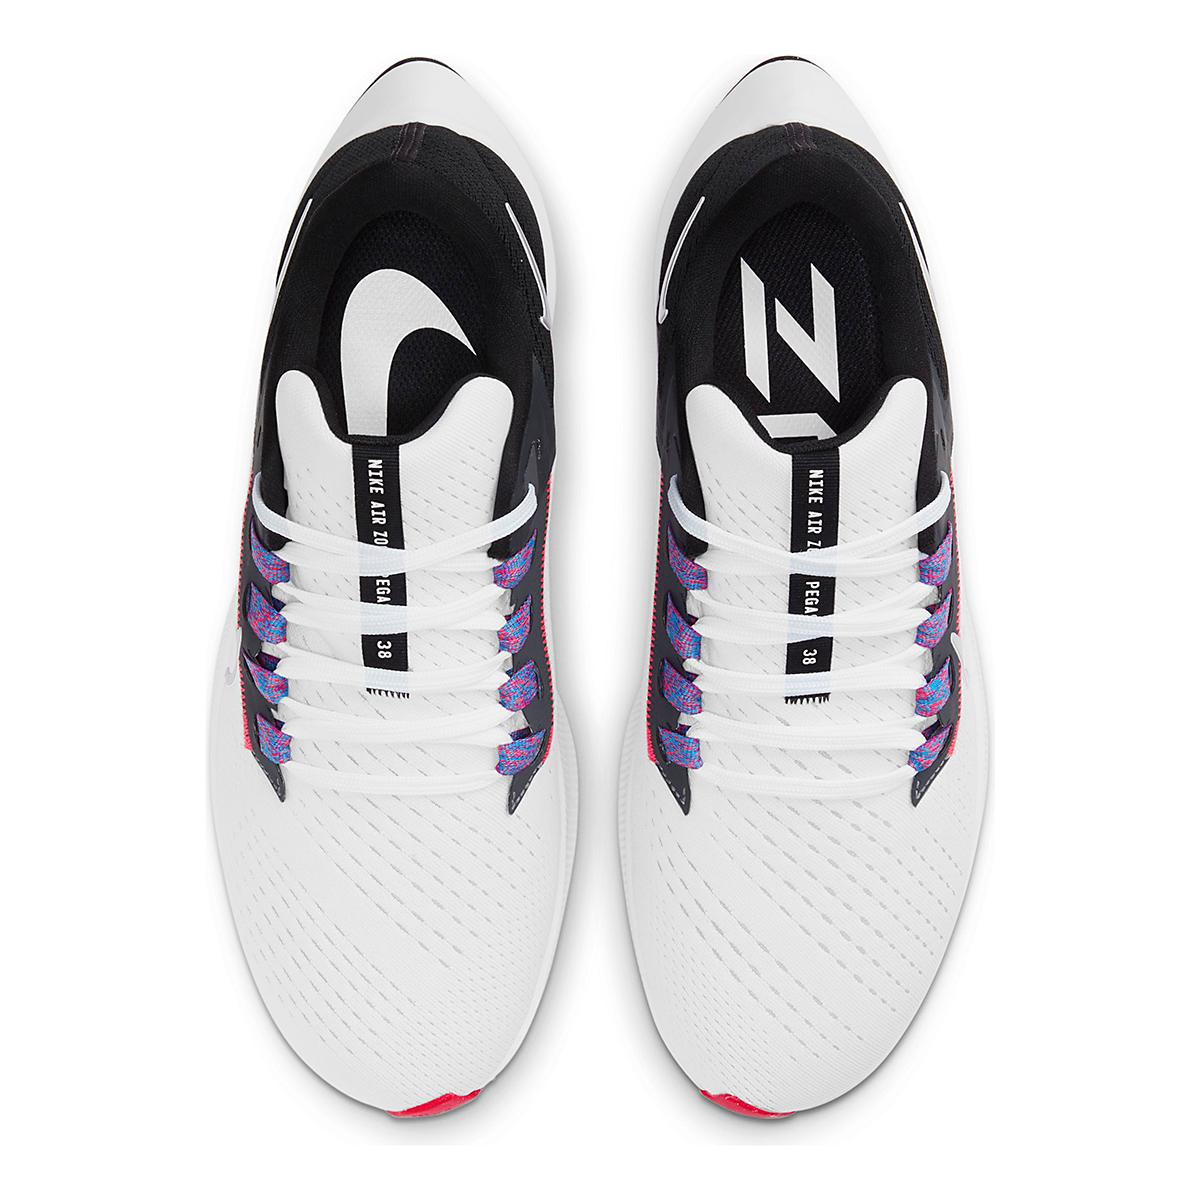 Women's Nike Air Zoom Pegasus 38 Running Shoe - Color: White/Metallic Silver/Black - Size: 5 - Width: Regular, White/Metallic Silver/Black, large, image 6